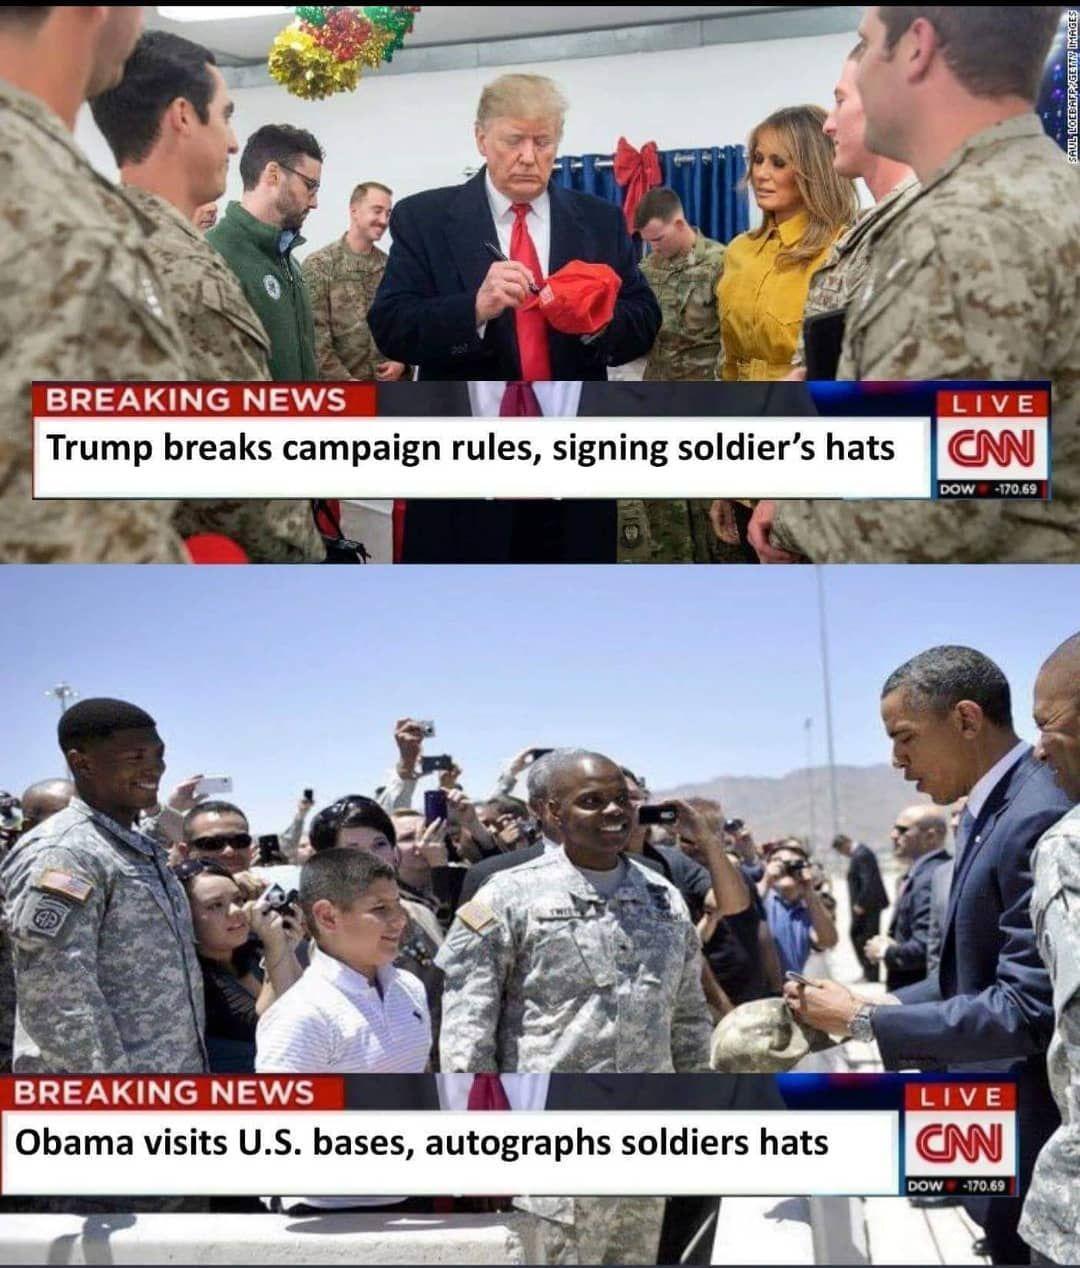 Cnn Fake News Misdirection Misleading Incomplete Hypocrite